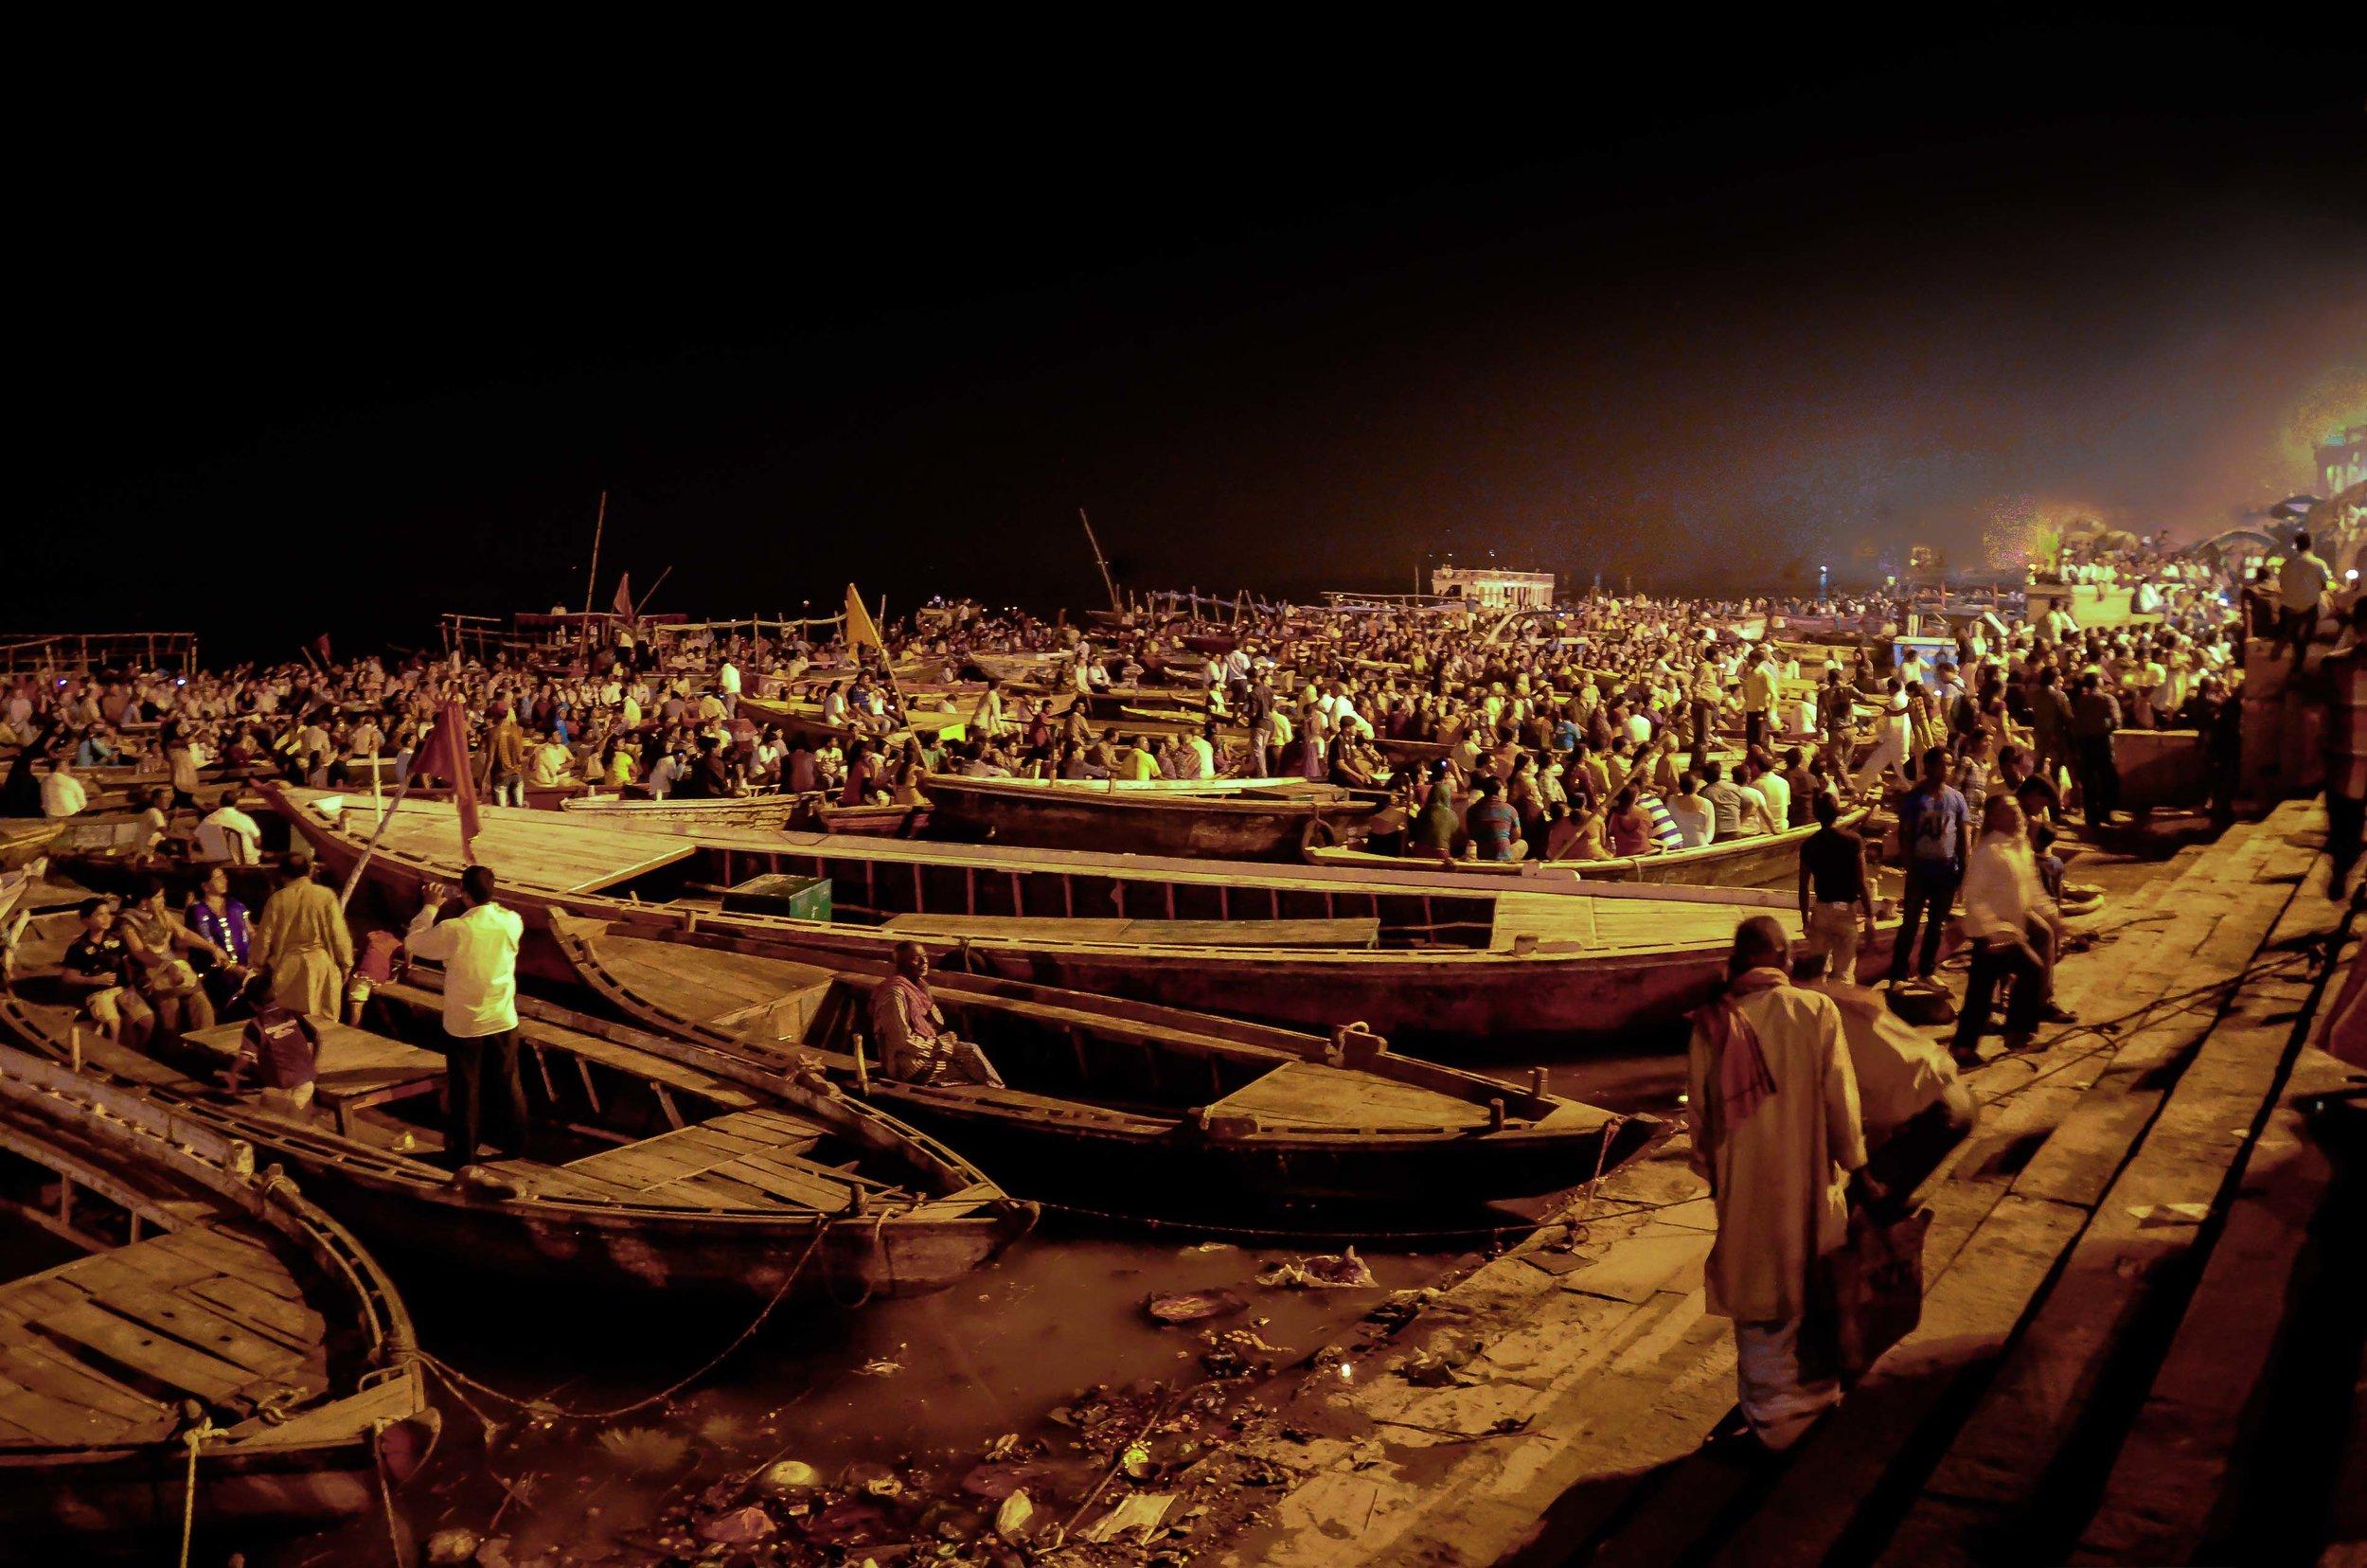 Evening Memorial Tribute 1, Varanasi, India 2012